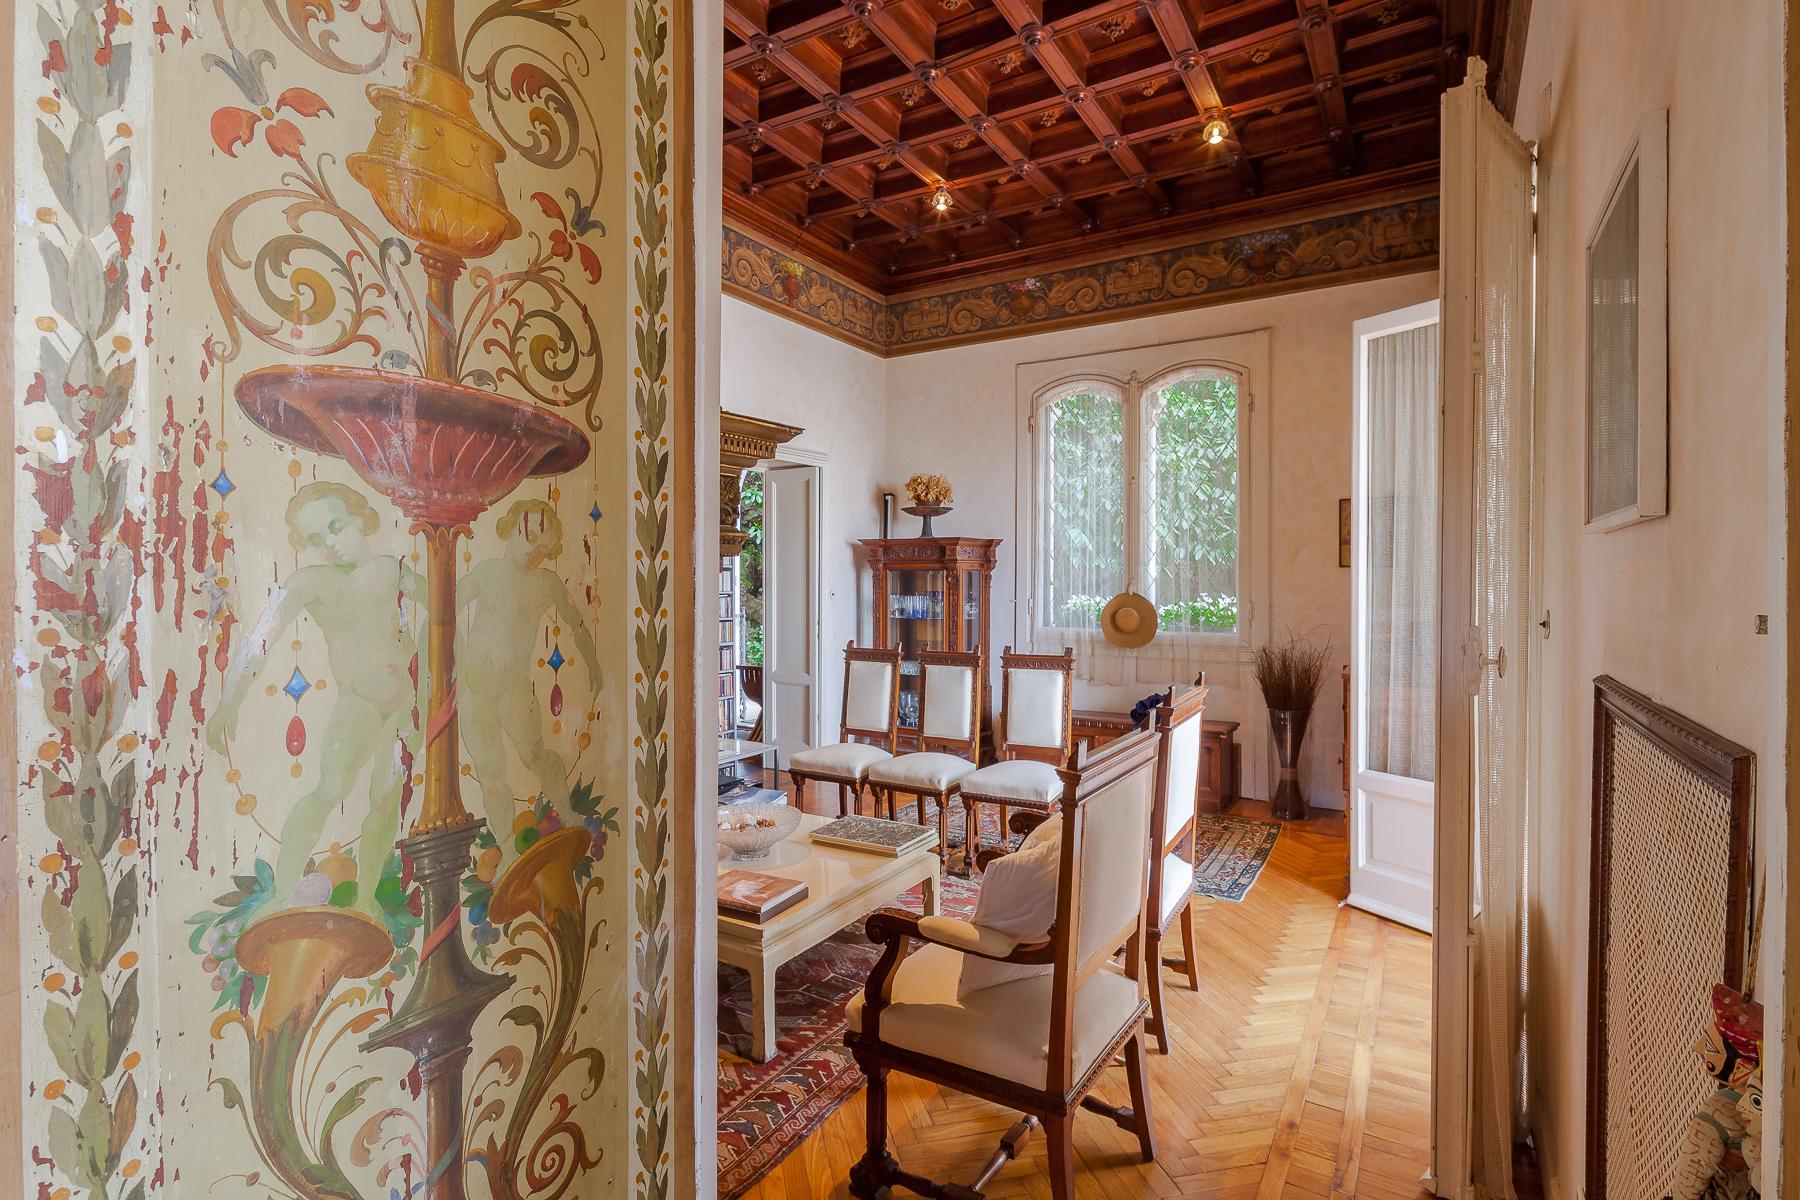 Villa in Vendita a Varese: 5 locali, 375 mq - Foto 8